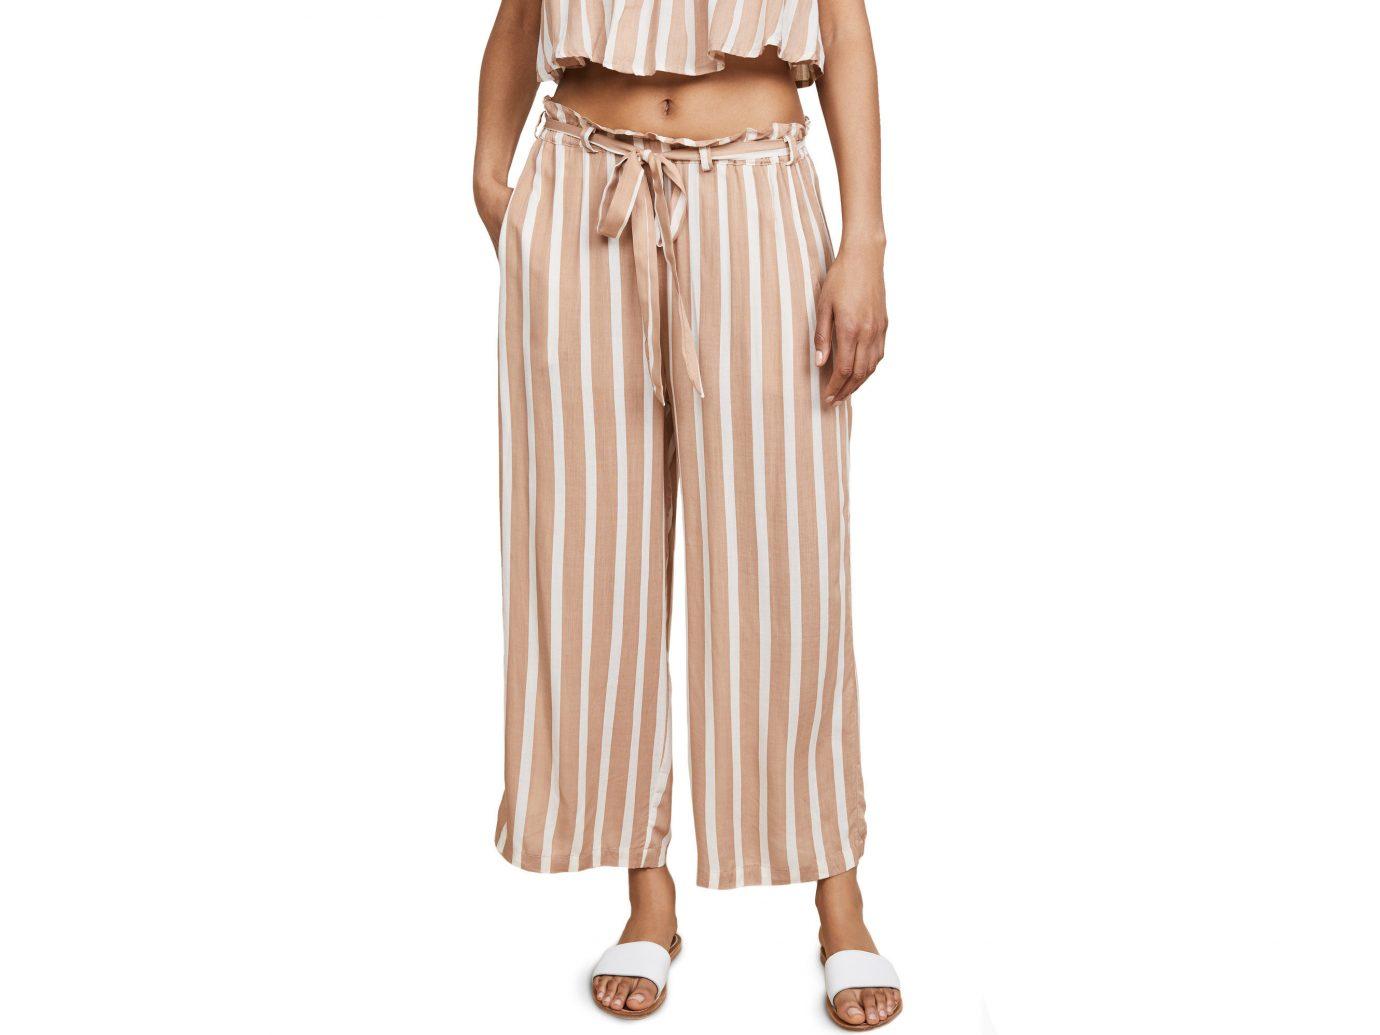 Trip Ideas clothing day dress waist active pants joint trunk dress product trousers abdomen peach one piece garment